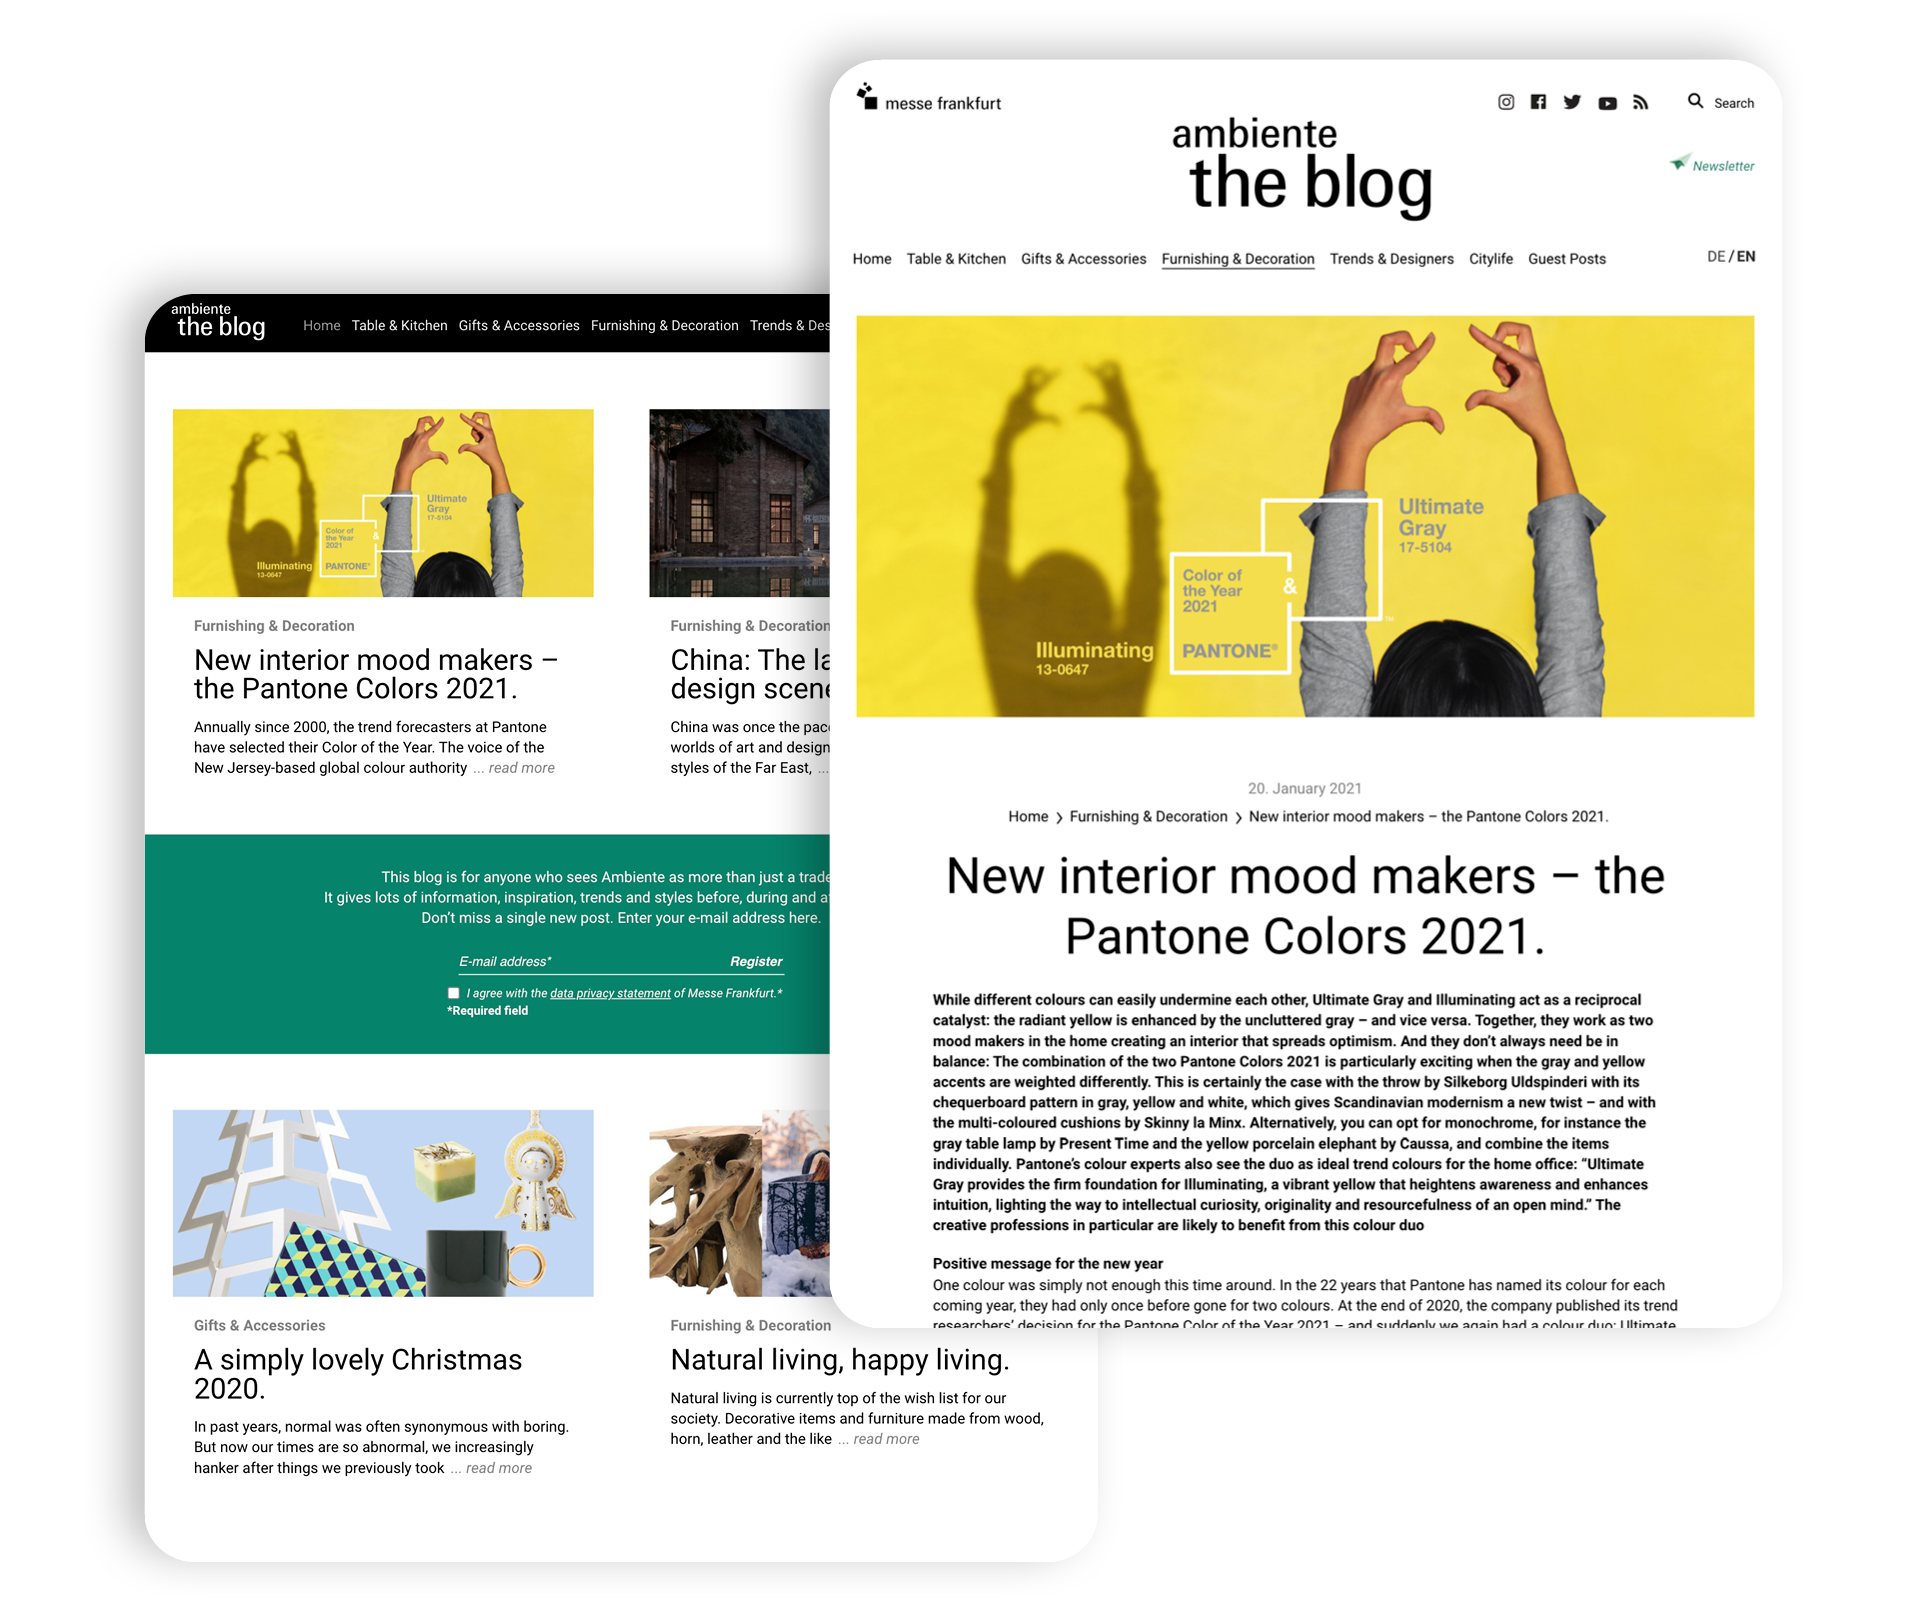 Screenshots of the WordPress Website of the Ambiente Blog